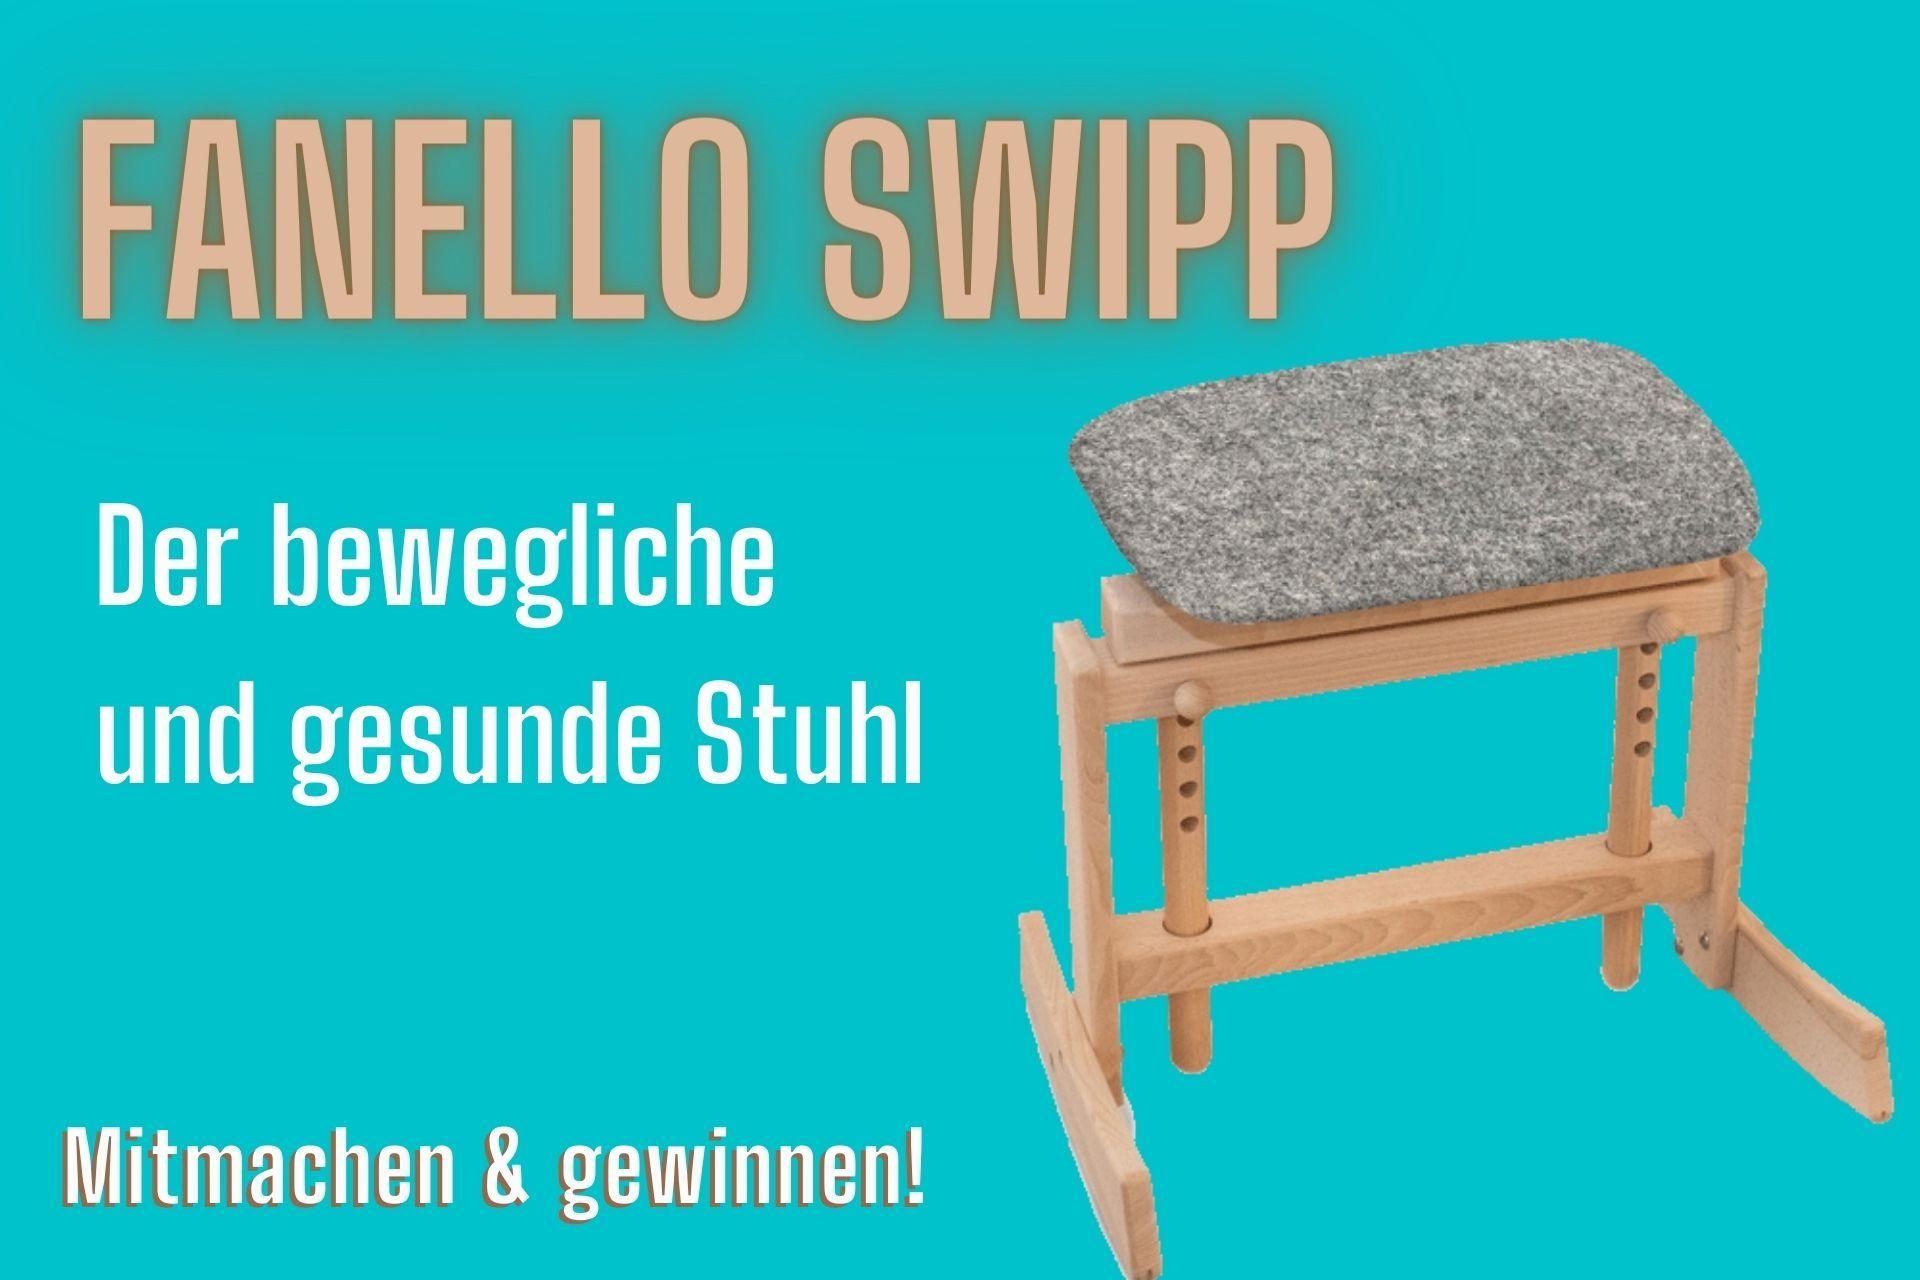 Fanello_Swipp_Preis.jpg